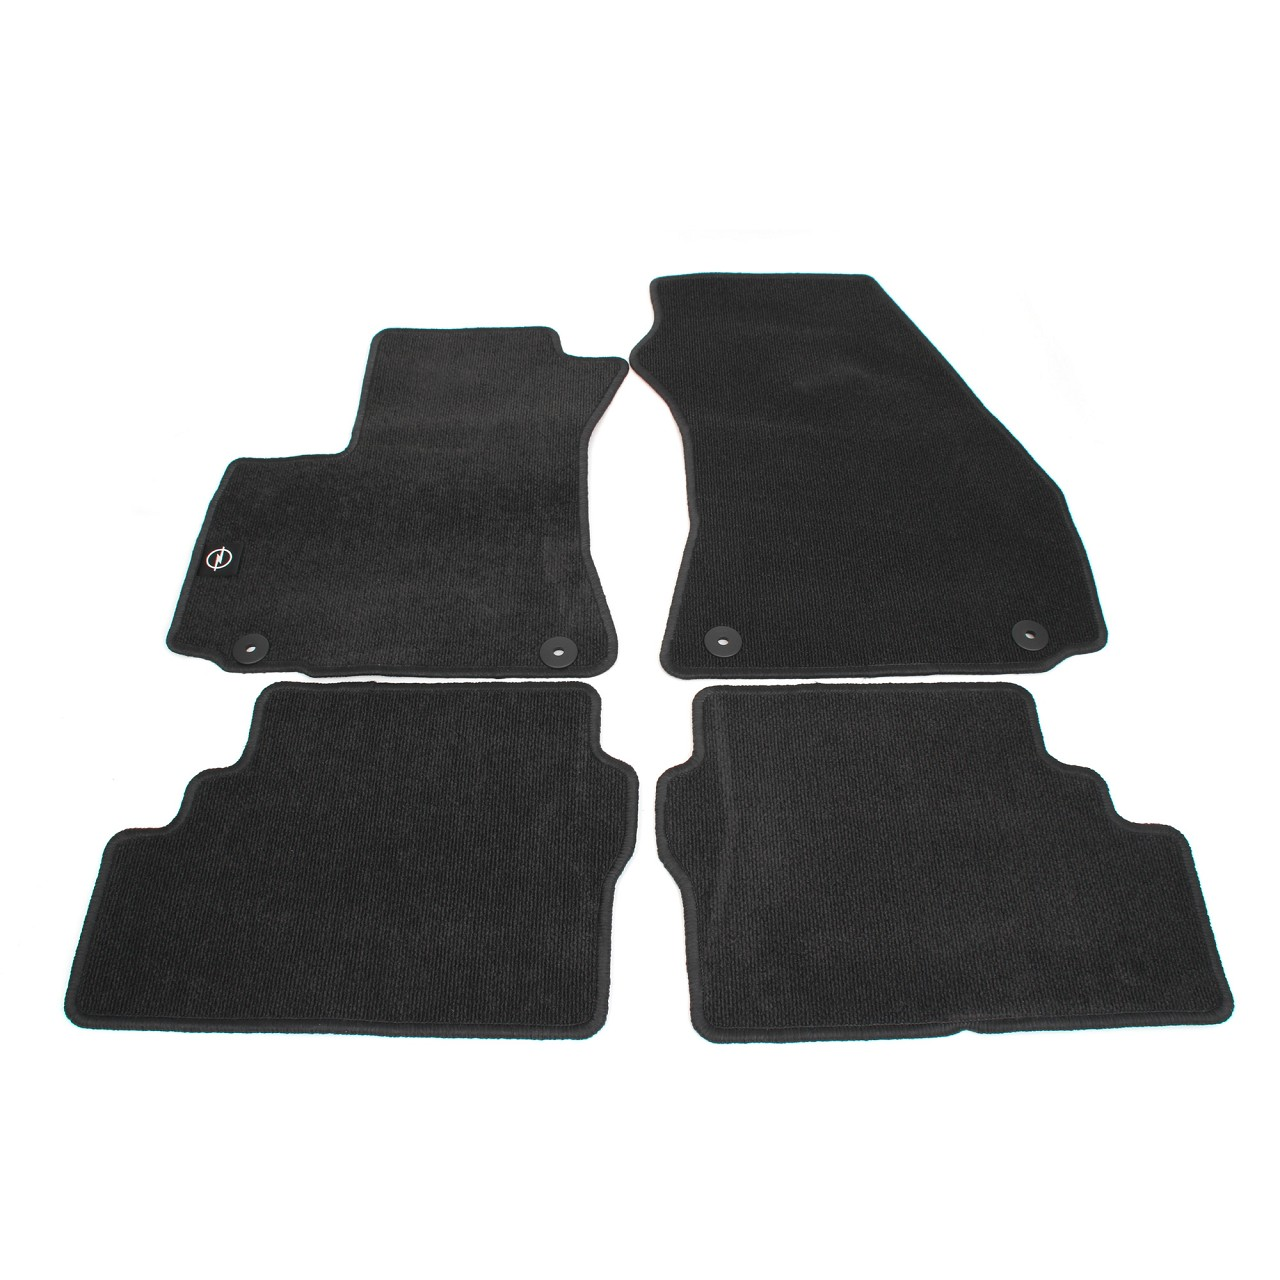 ORIGINAL Opel Textilmatten Fußmatten Automatten Fine-Rip Satz ZAFIRA A 93179560